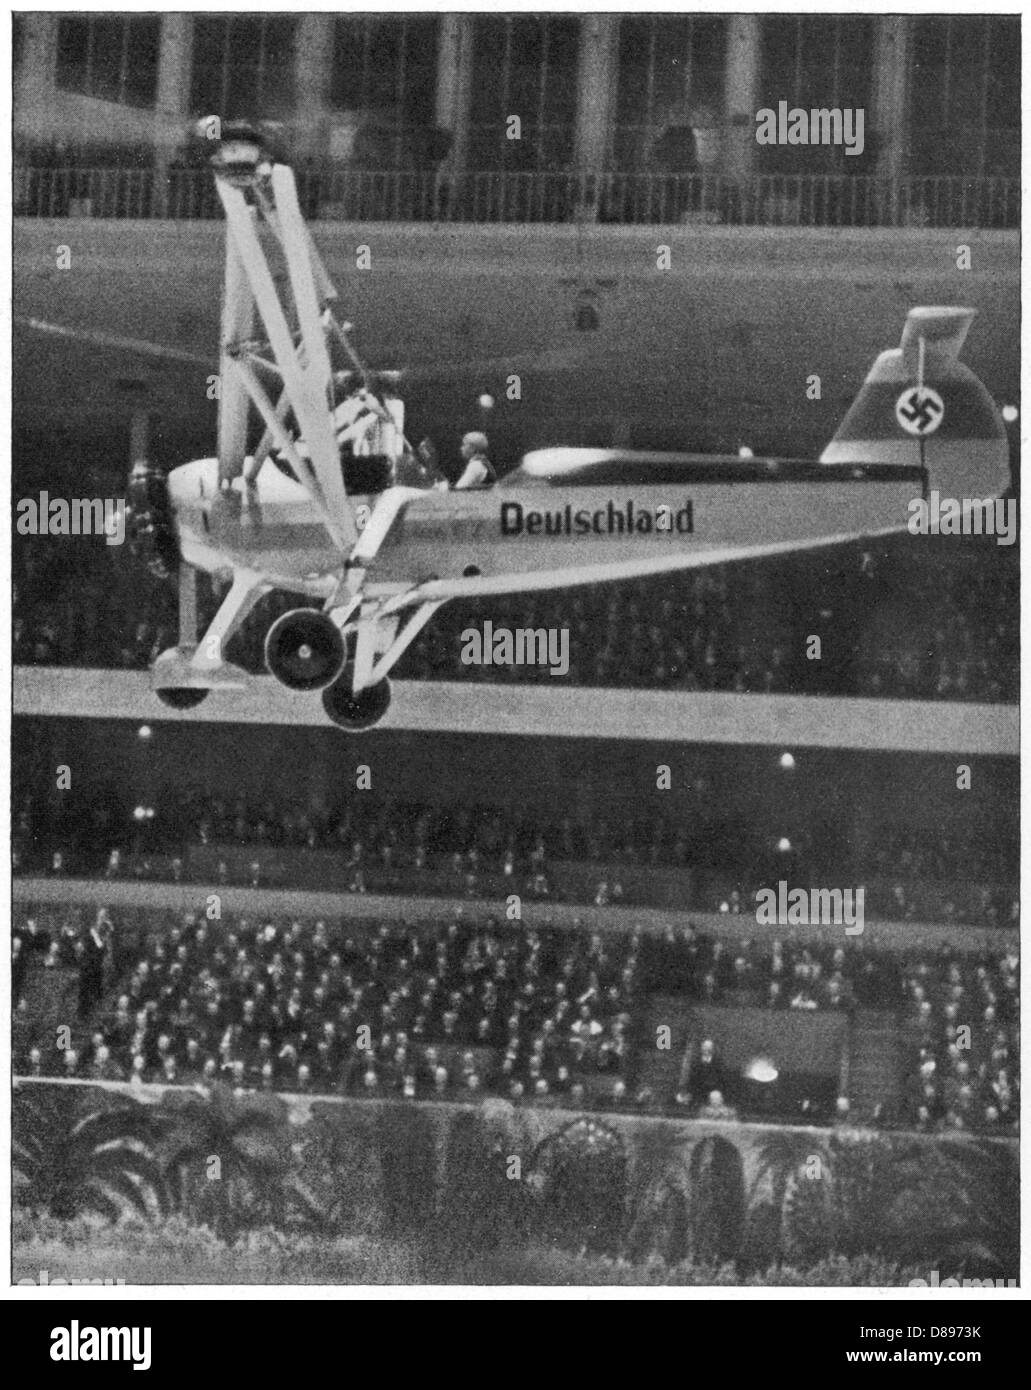 Focke Helicopter 1 - Stock Image